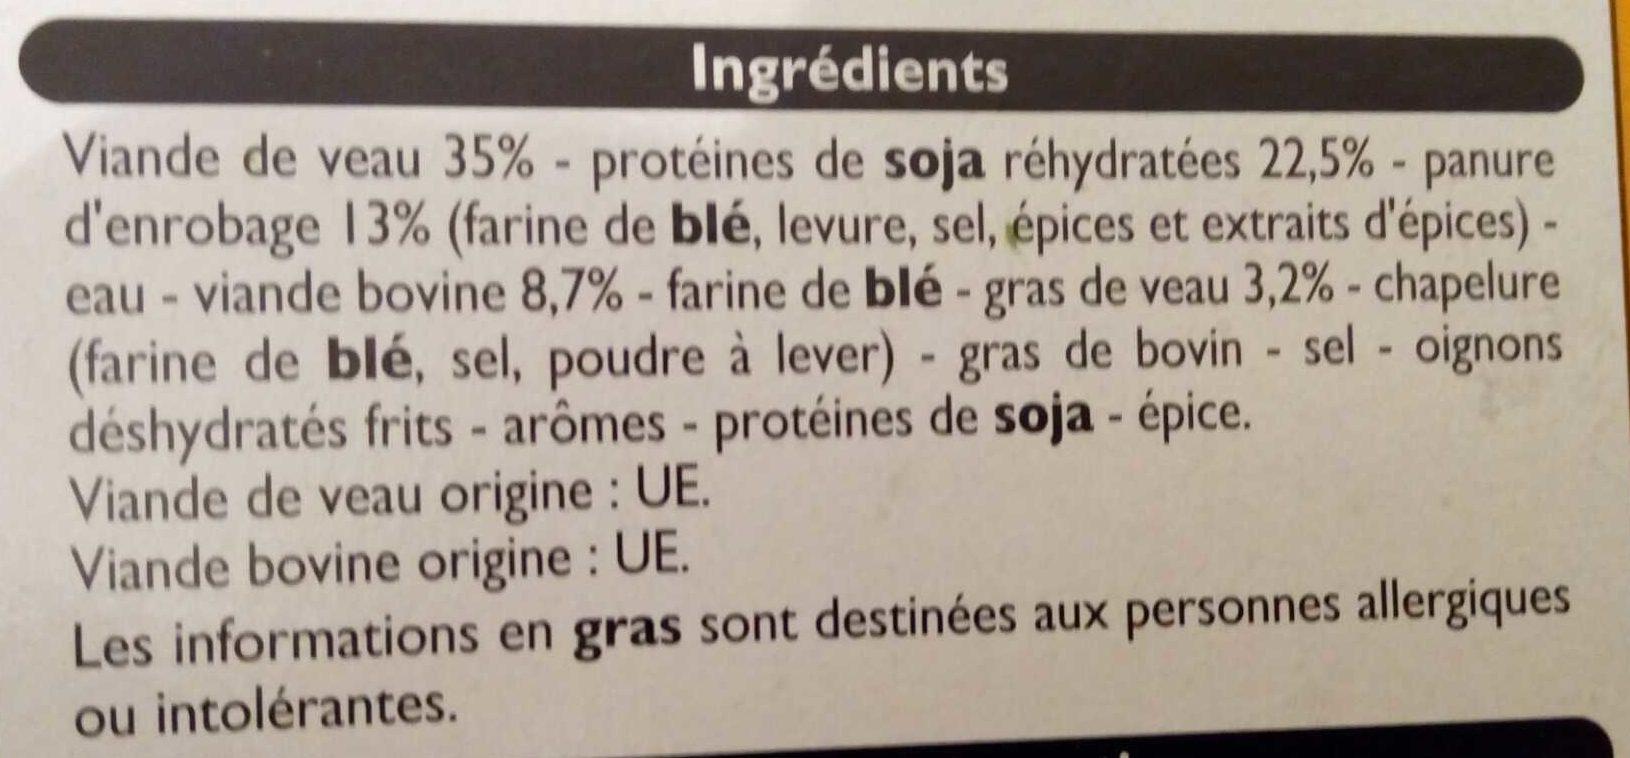 Grillad'veau - Ingrediënten - fr